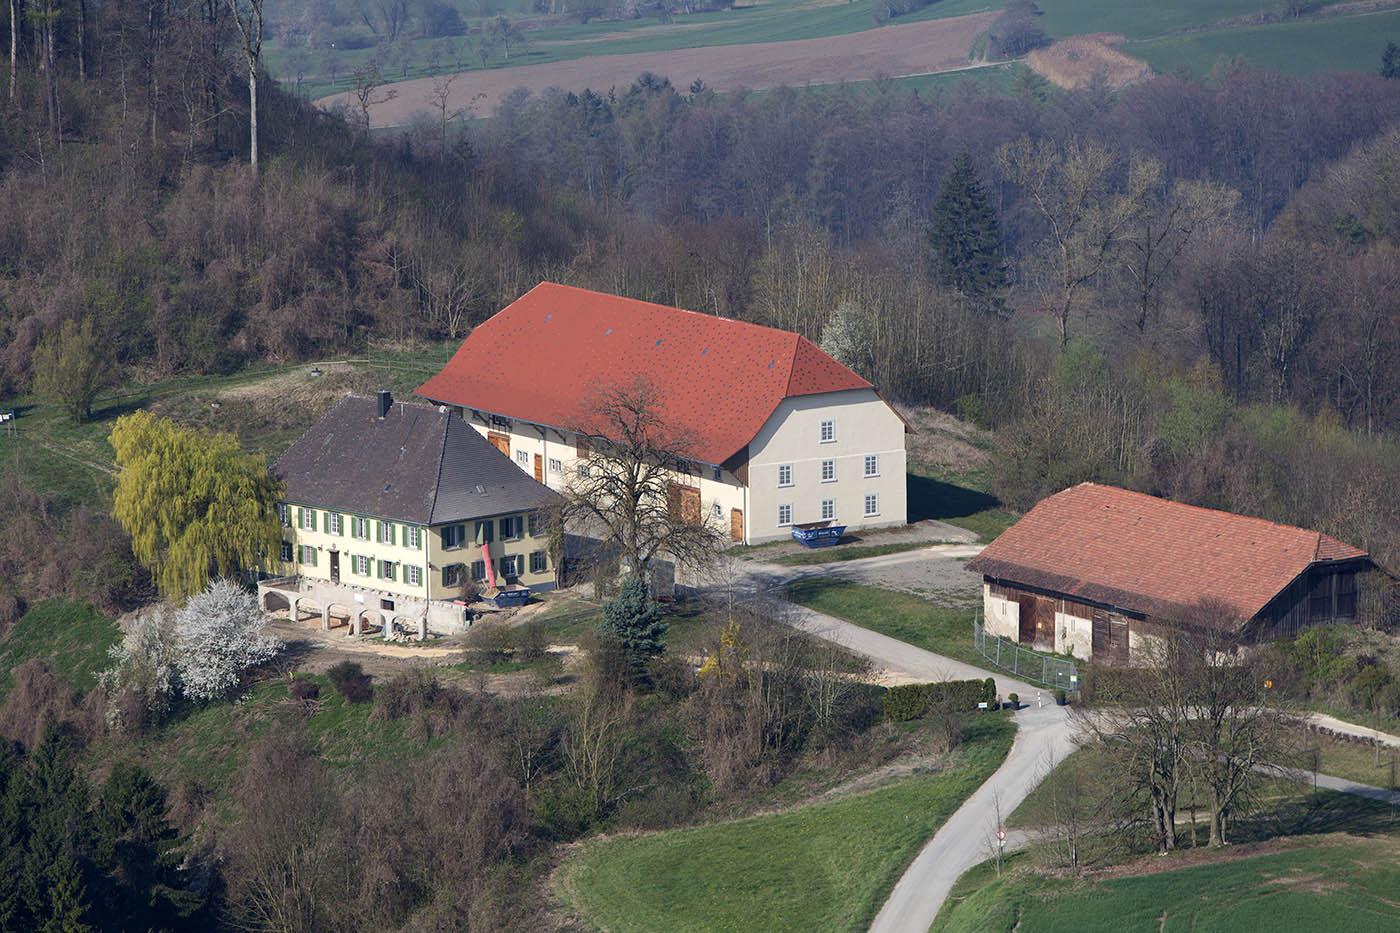 Nellenburg